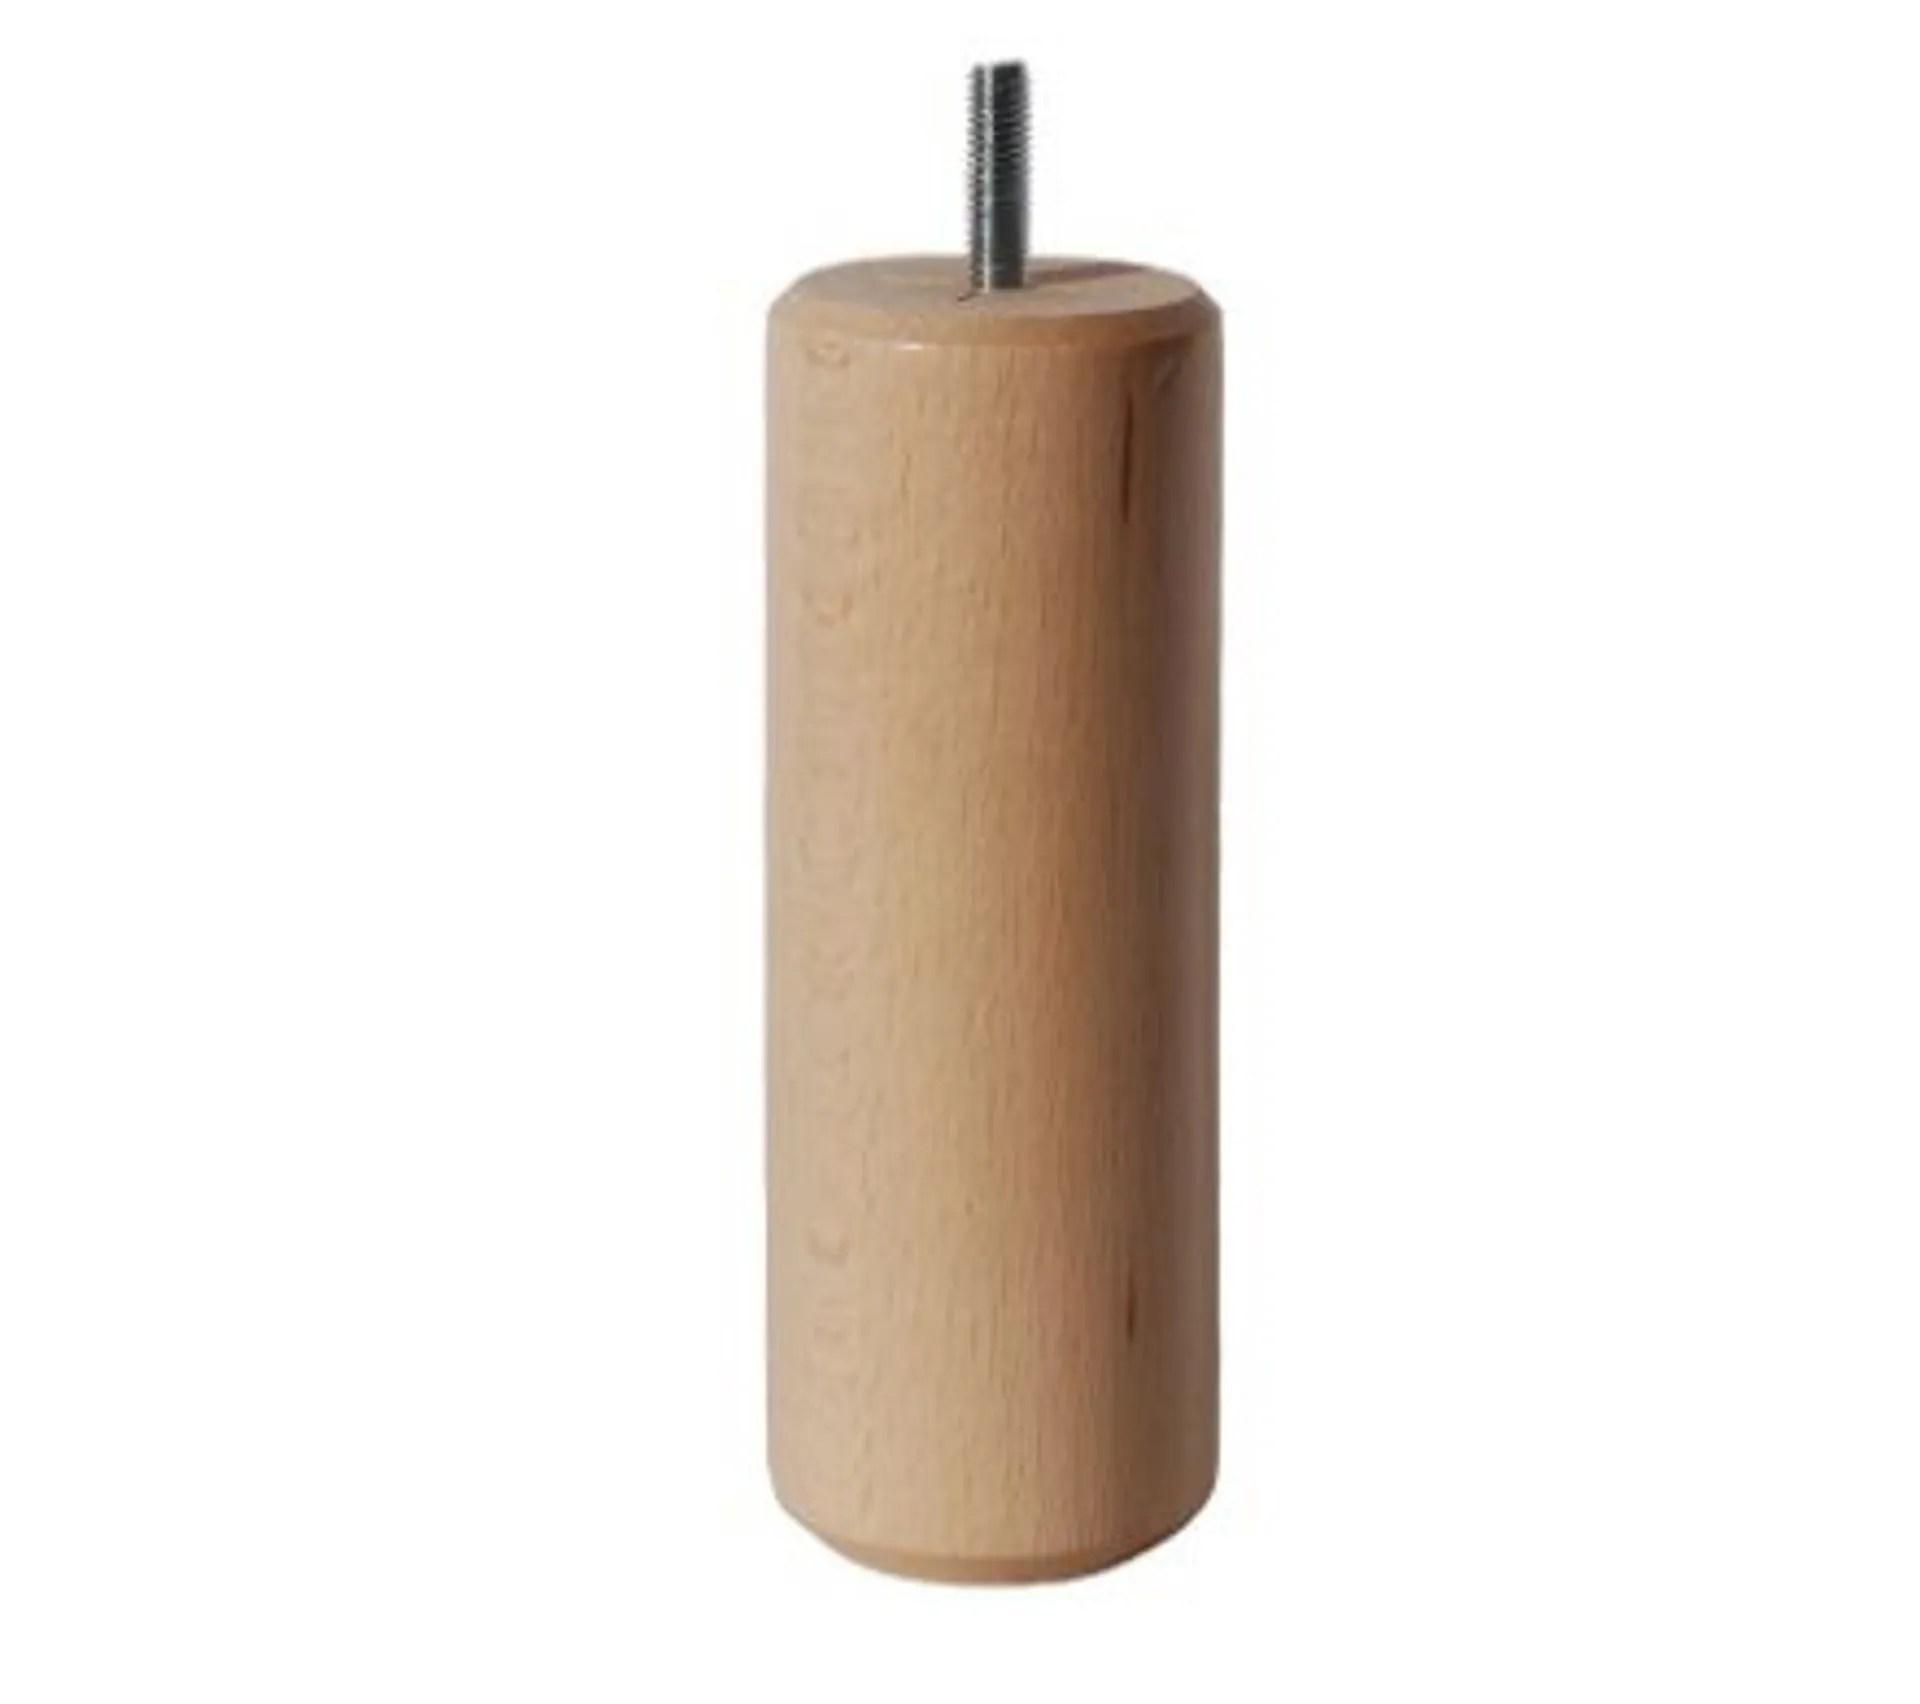 jeu de 4 pieds h 14 5 cm dreamea cylindre